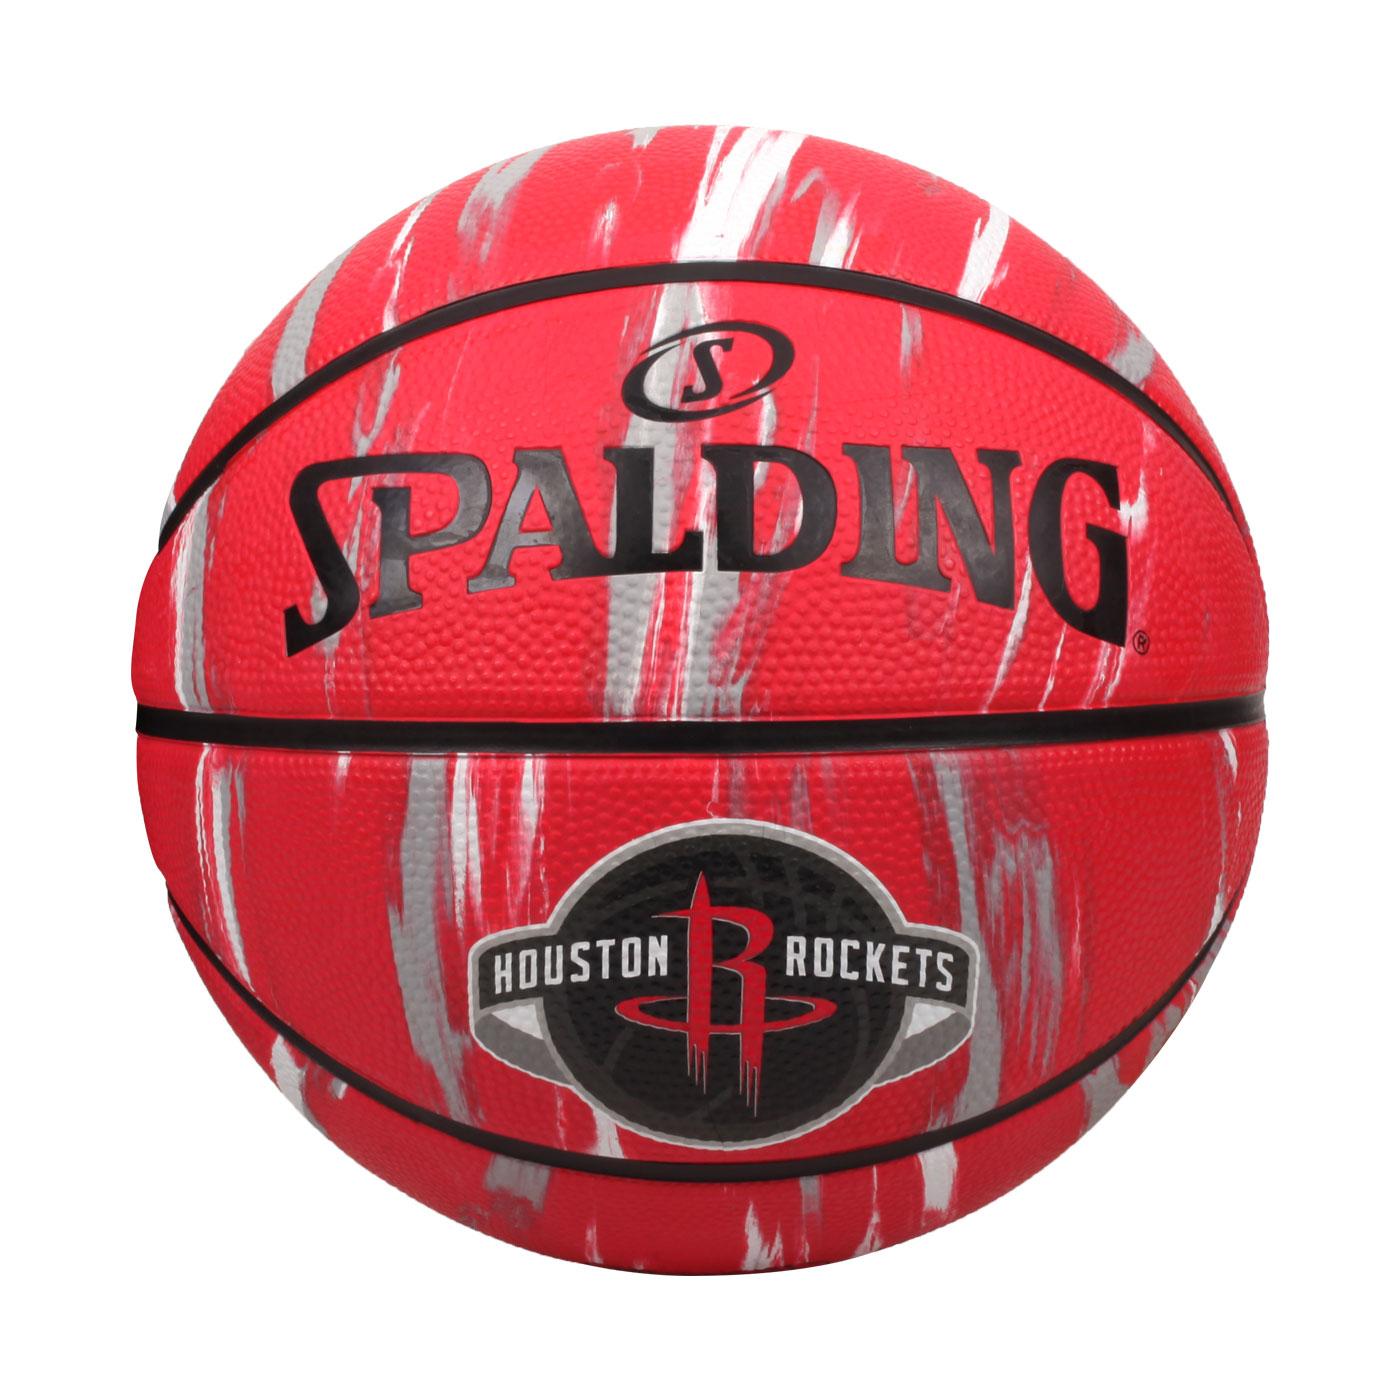 SPALDING NBA隊徽-火箭 #7籃球 SPA39739 SPA84150 - 紅黑白灰